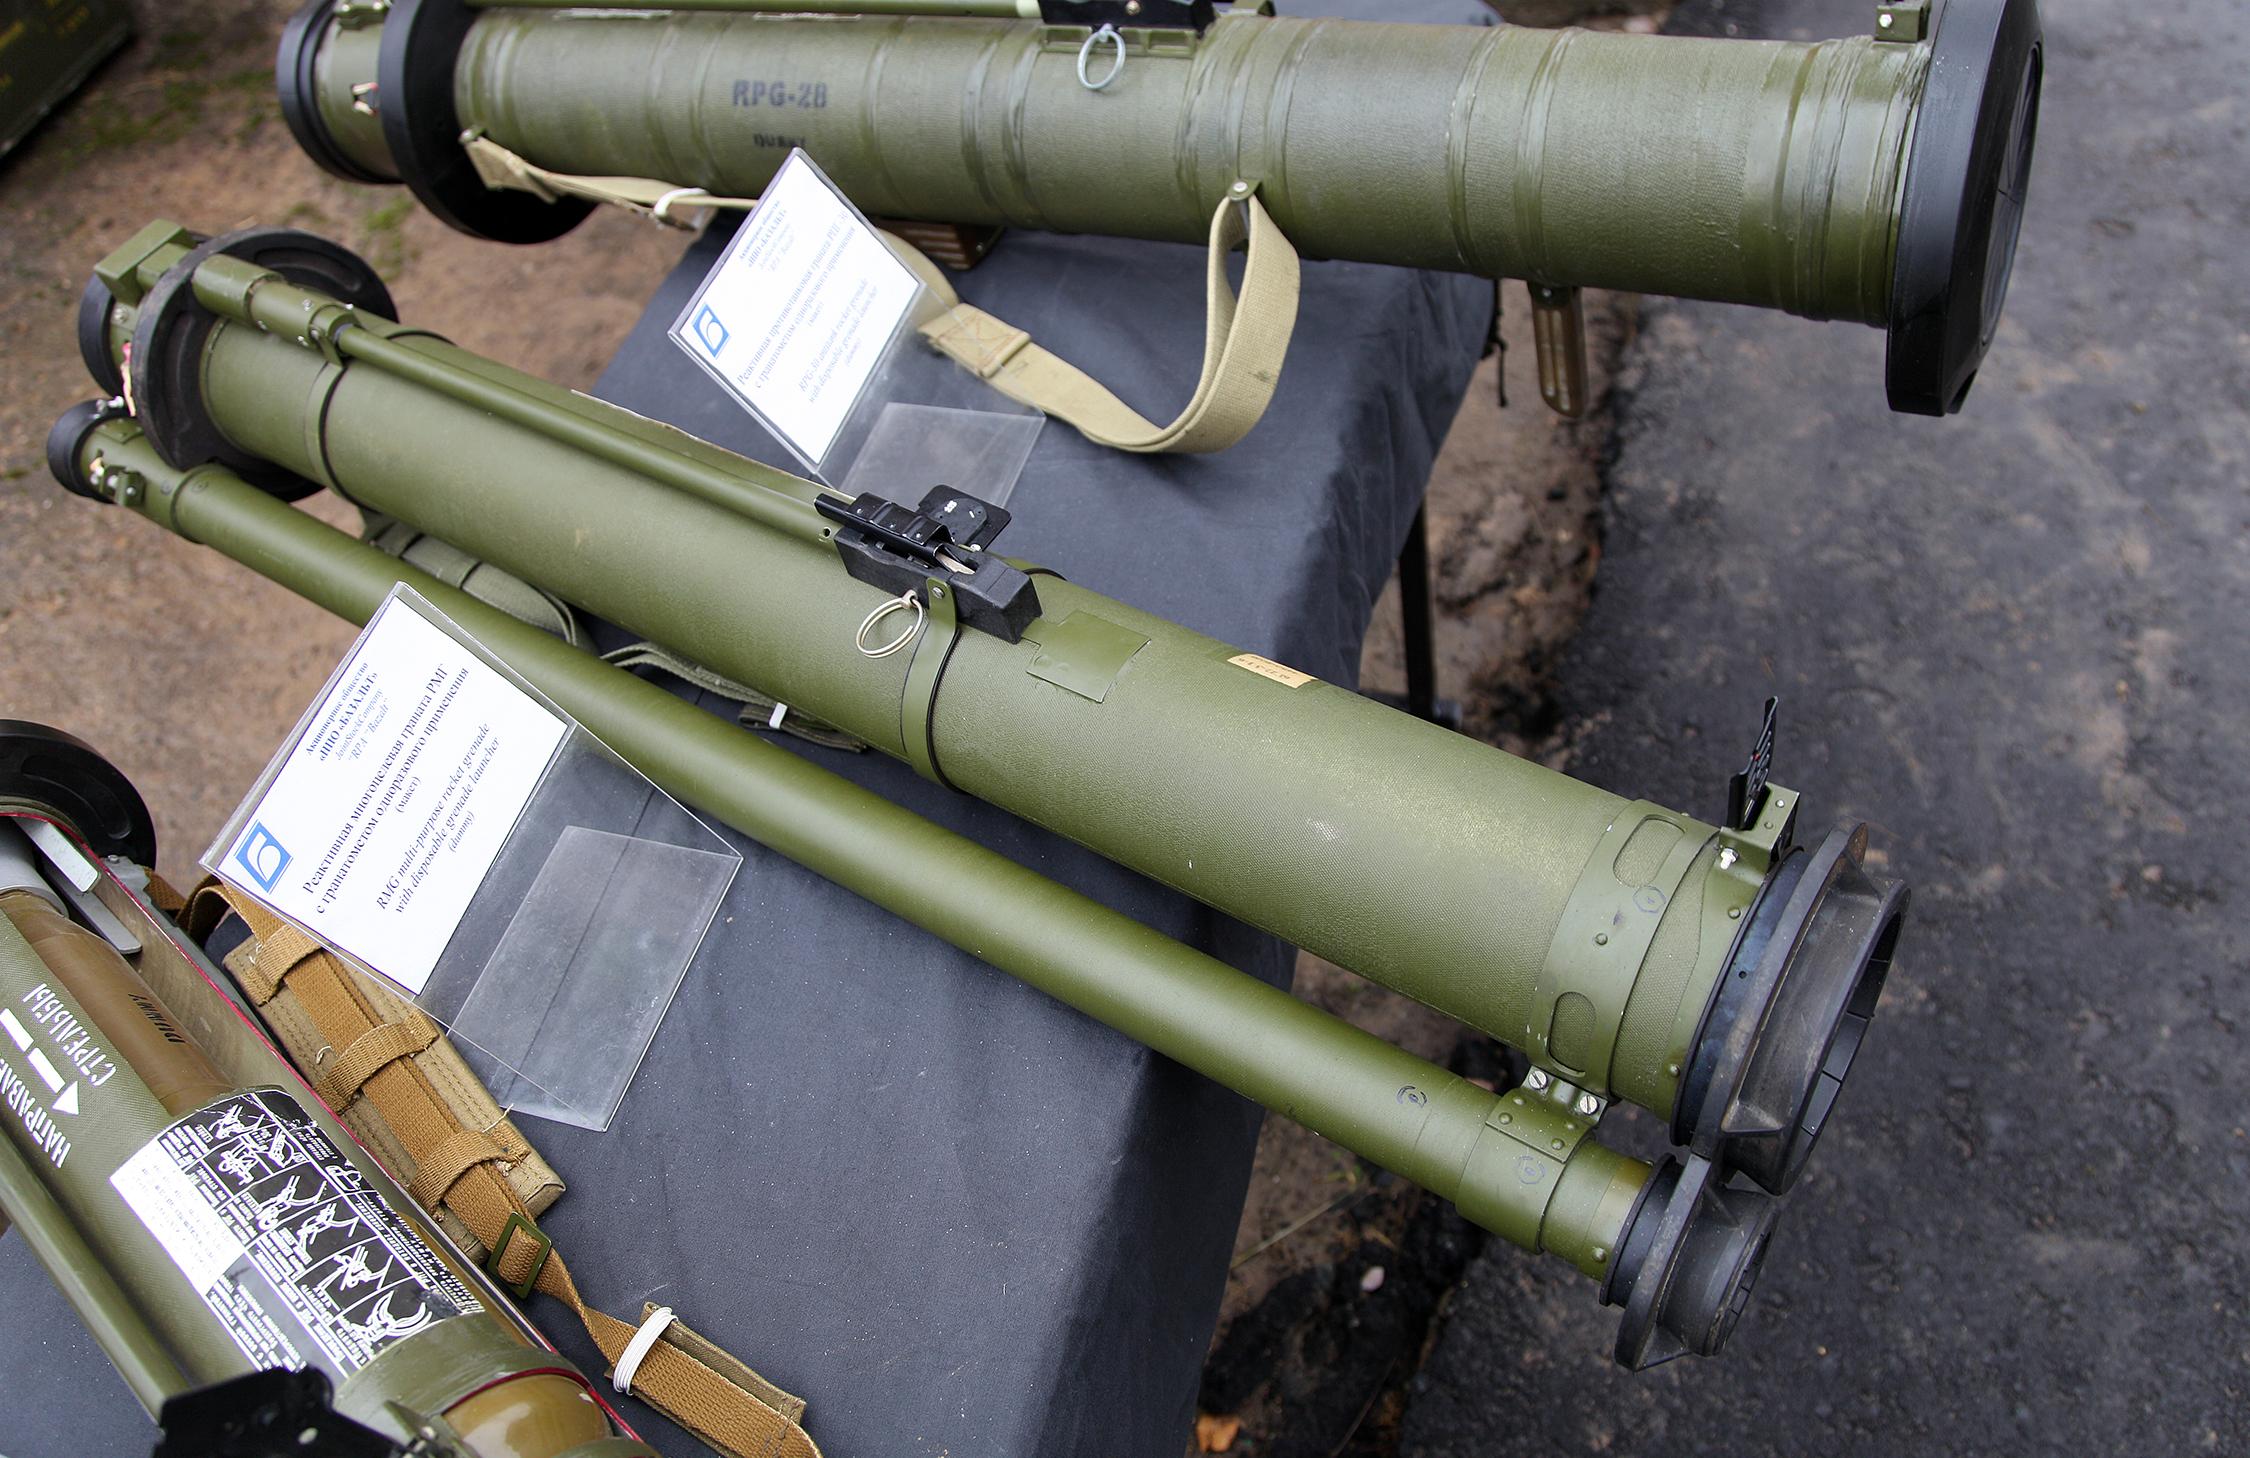 RPG-30_grenade_launcher_at_Interpolitex-2016_01.jpg